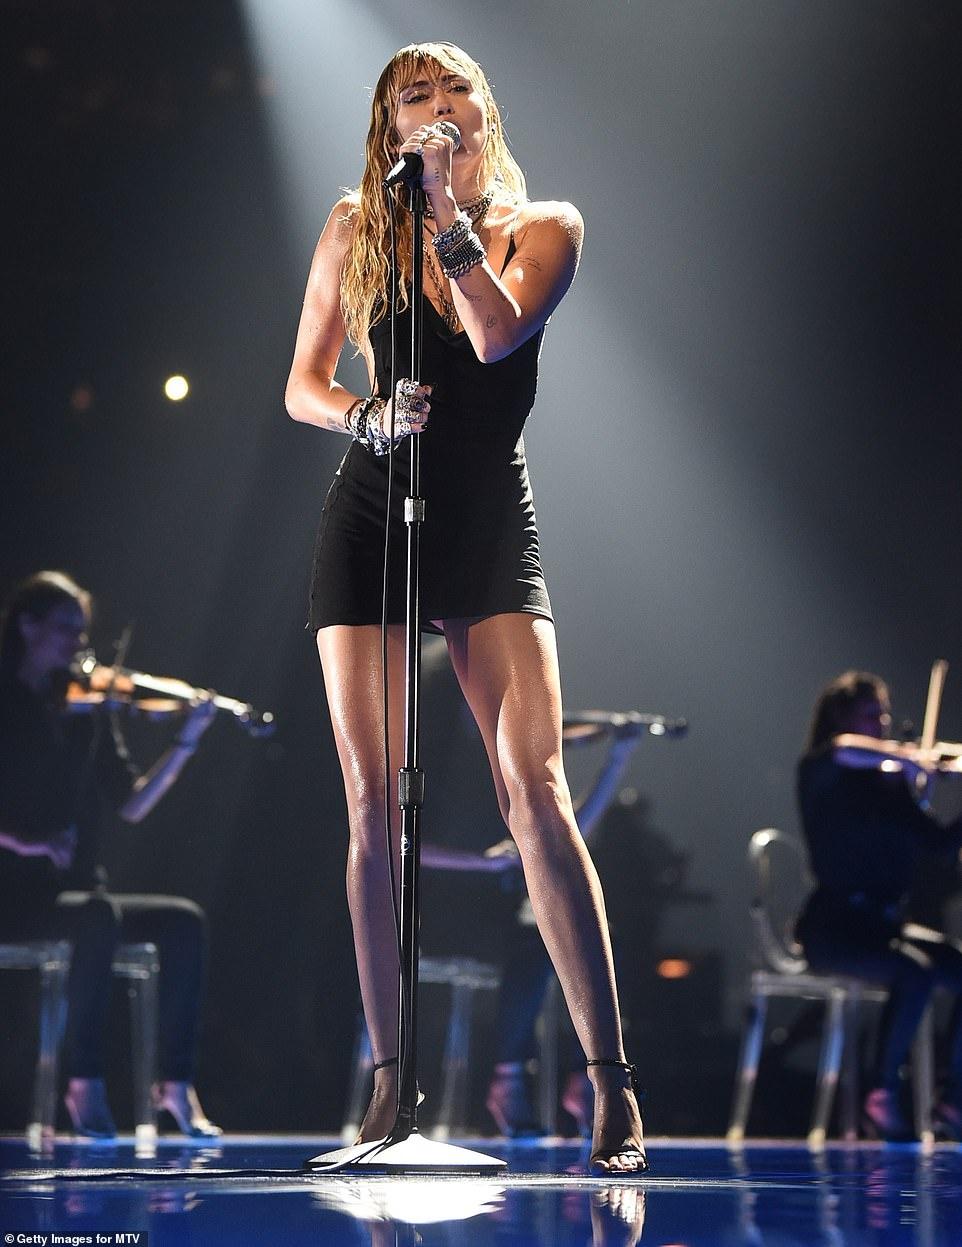 Miley Cyrus lai noi loan? hinh anh 4 17726076_0_image_m_25_1566871963780.jpg